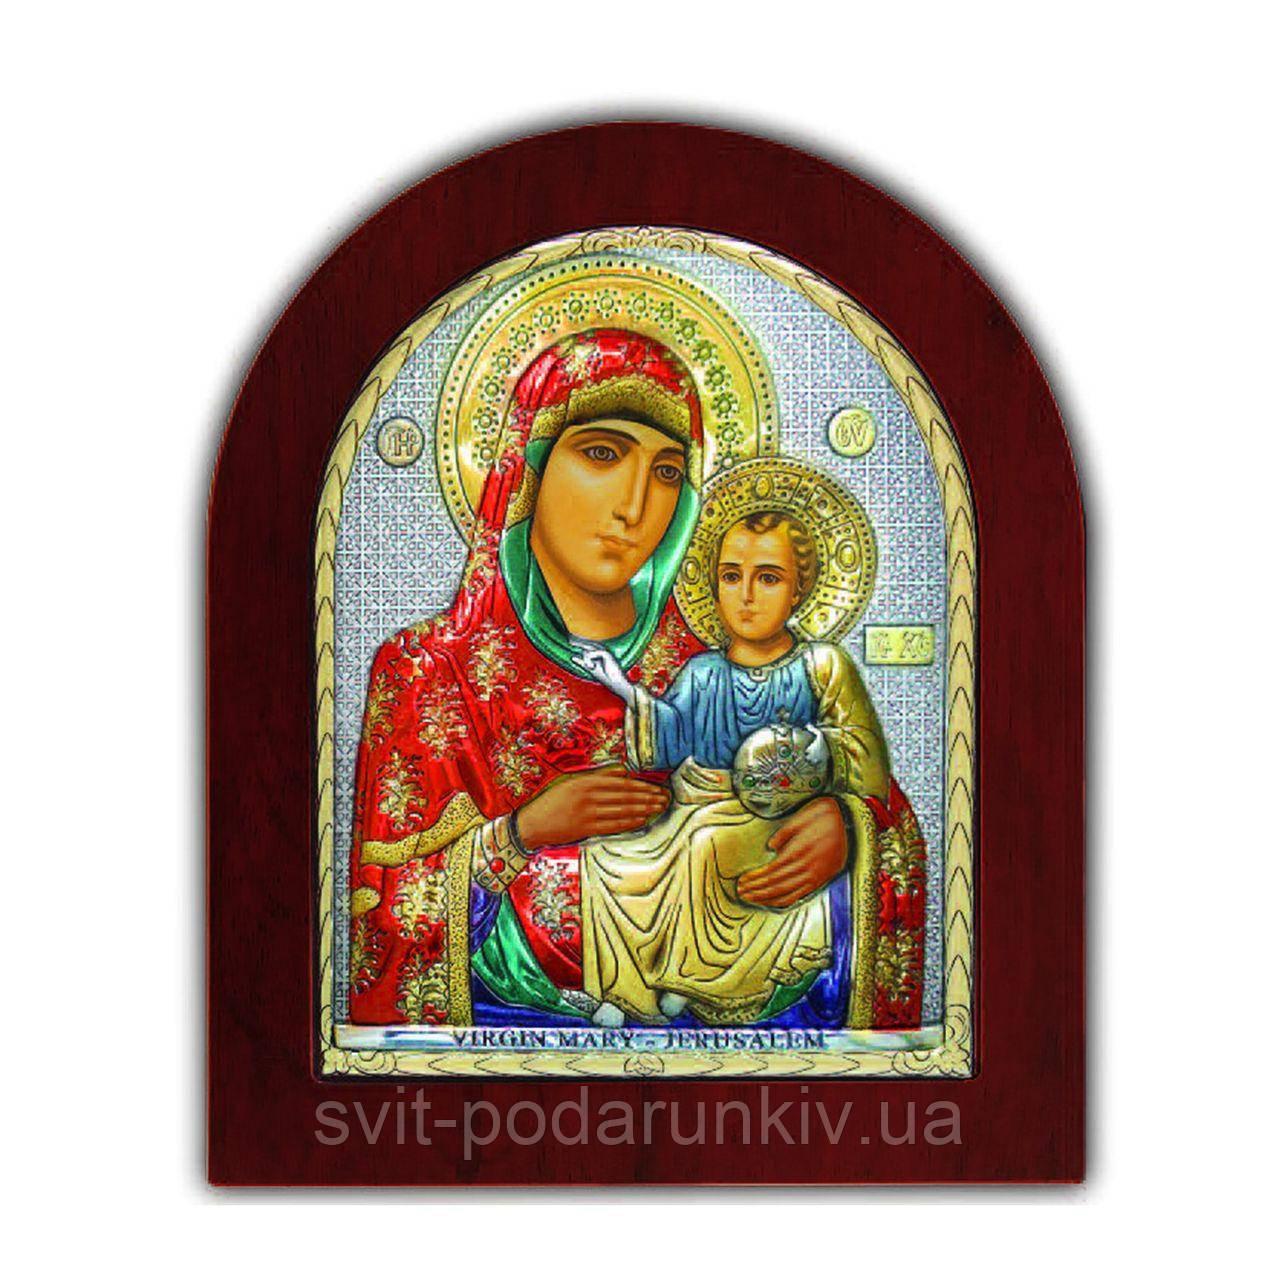 Икона Иерусалимская Богоматери EP3-006XAG/P/C Silver Axion